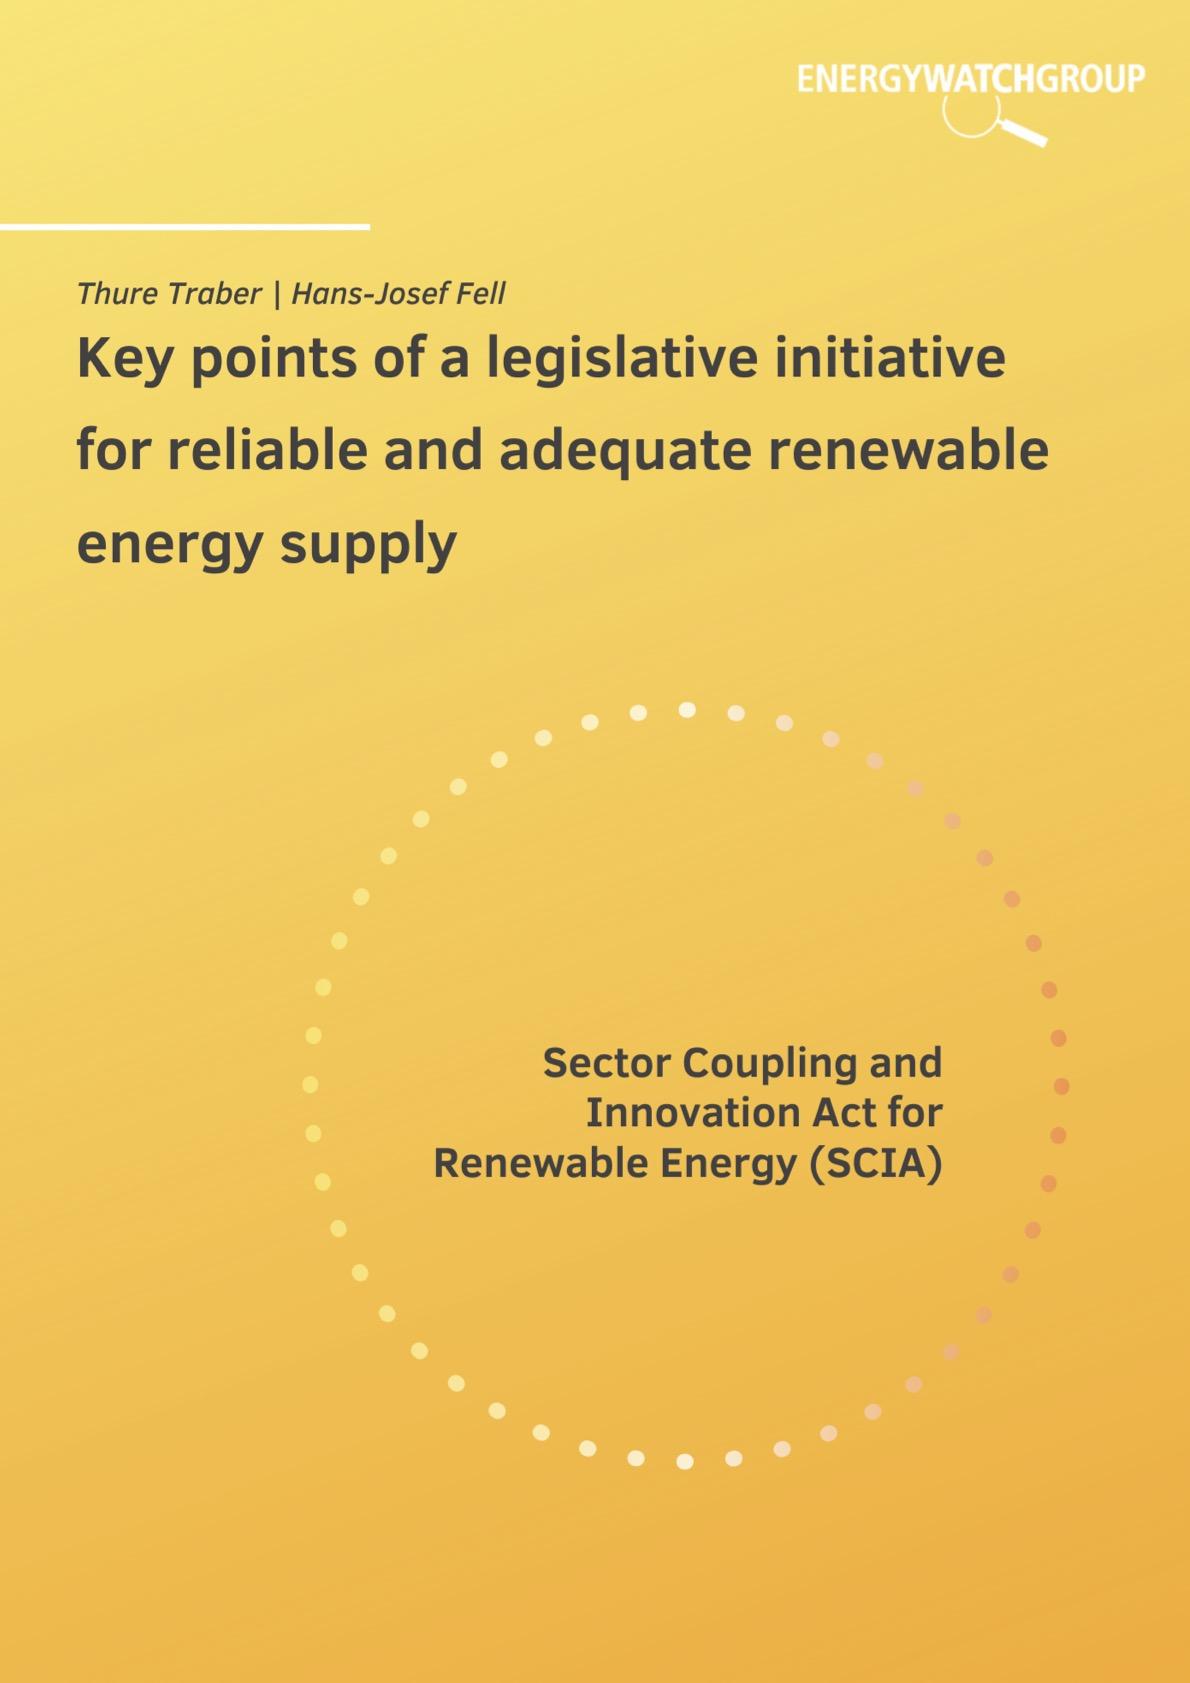 EWG_Key-points-of-a-legislative-initiative-for-reliable-adequate-renewable-energy-supply